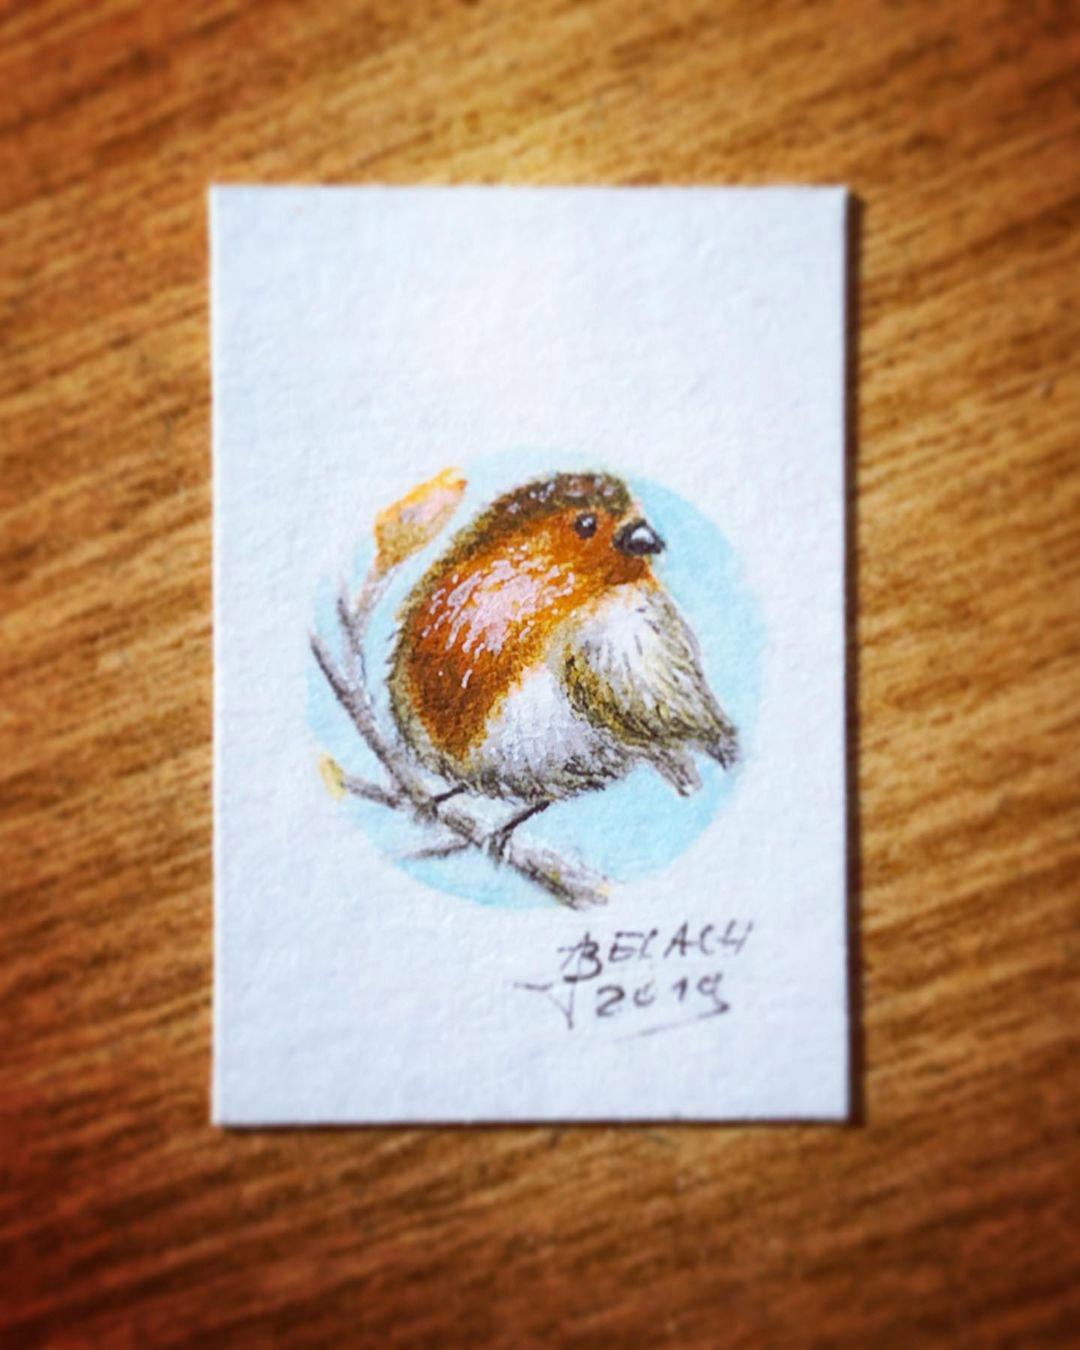 Macroaufnahme des Centpaintings: Ein Miniatur-Rotkehlchen